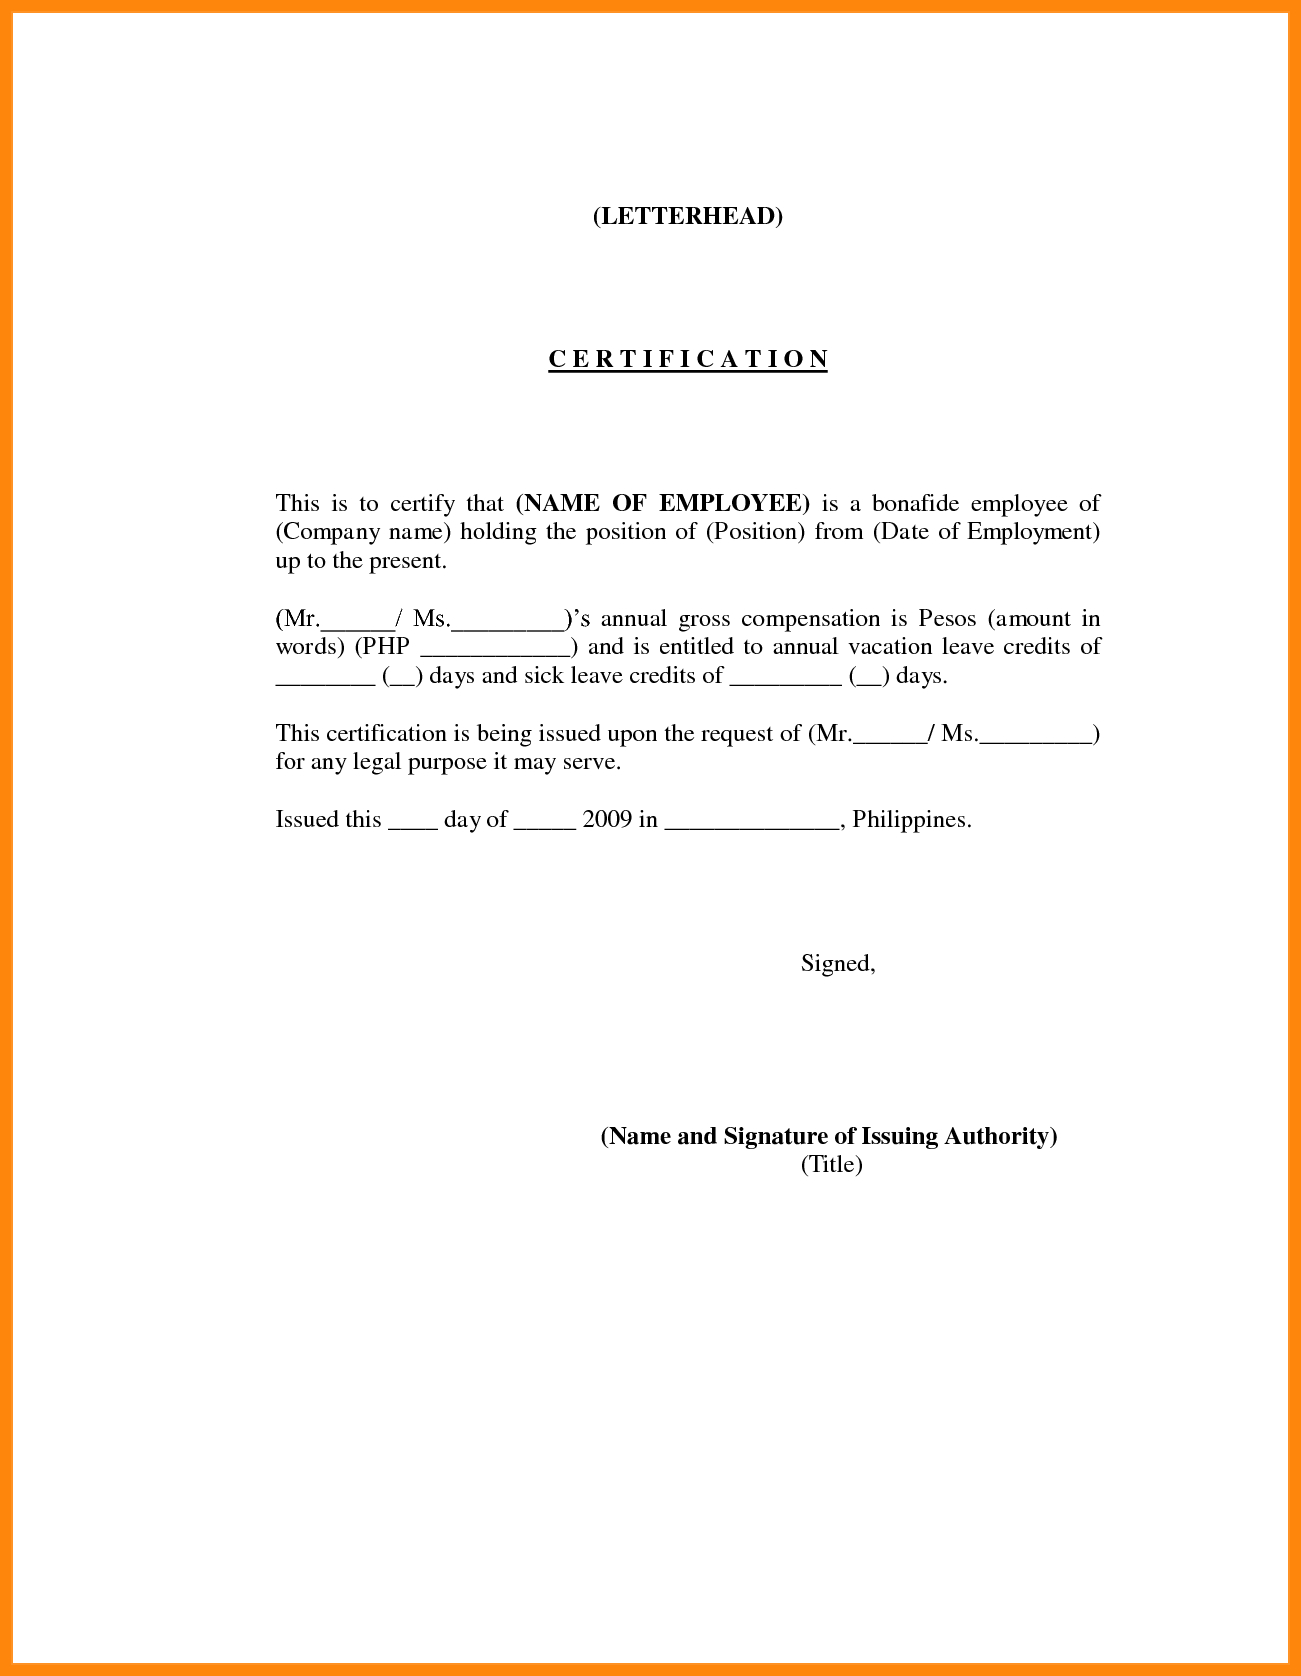 Employment Certification Sample  Nurse Resumed  Yon Youet Regarding Certificate Of Employment Template